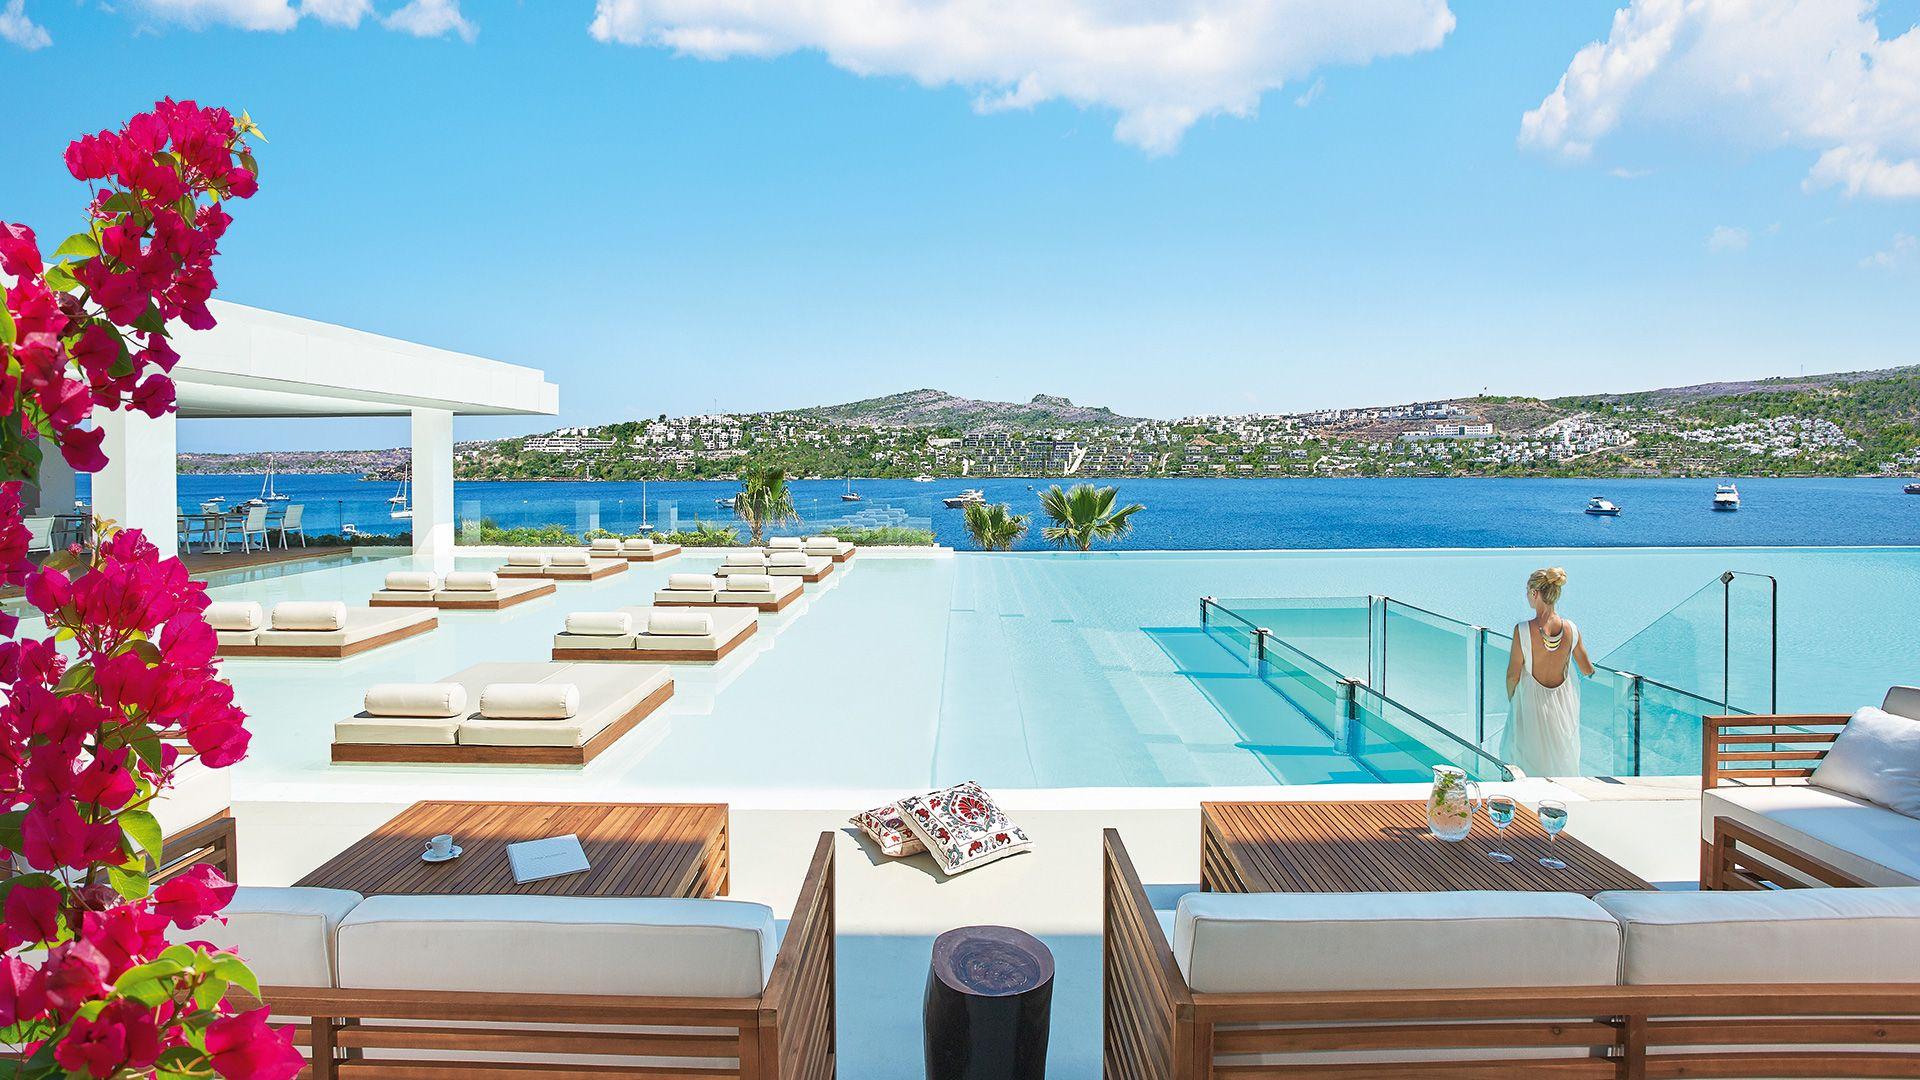 Hotel in bodrum turkey cape bodrum beach resort for Luxury hotel packages